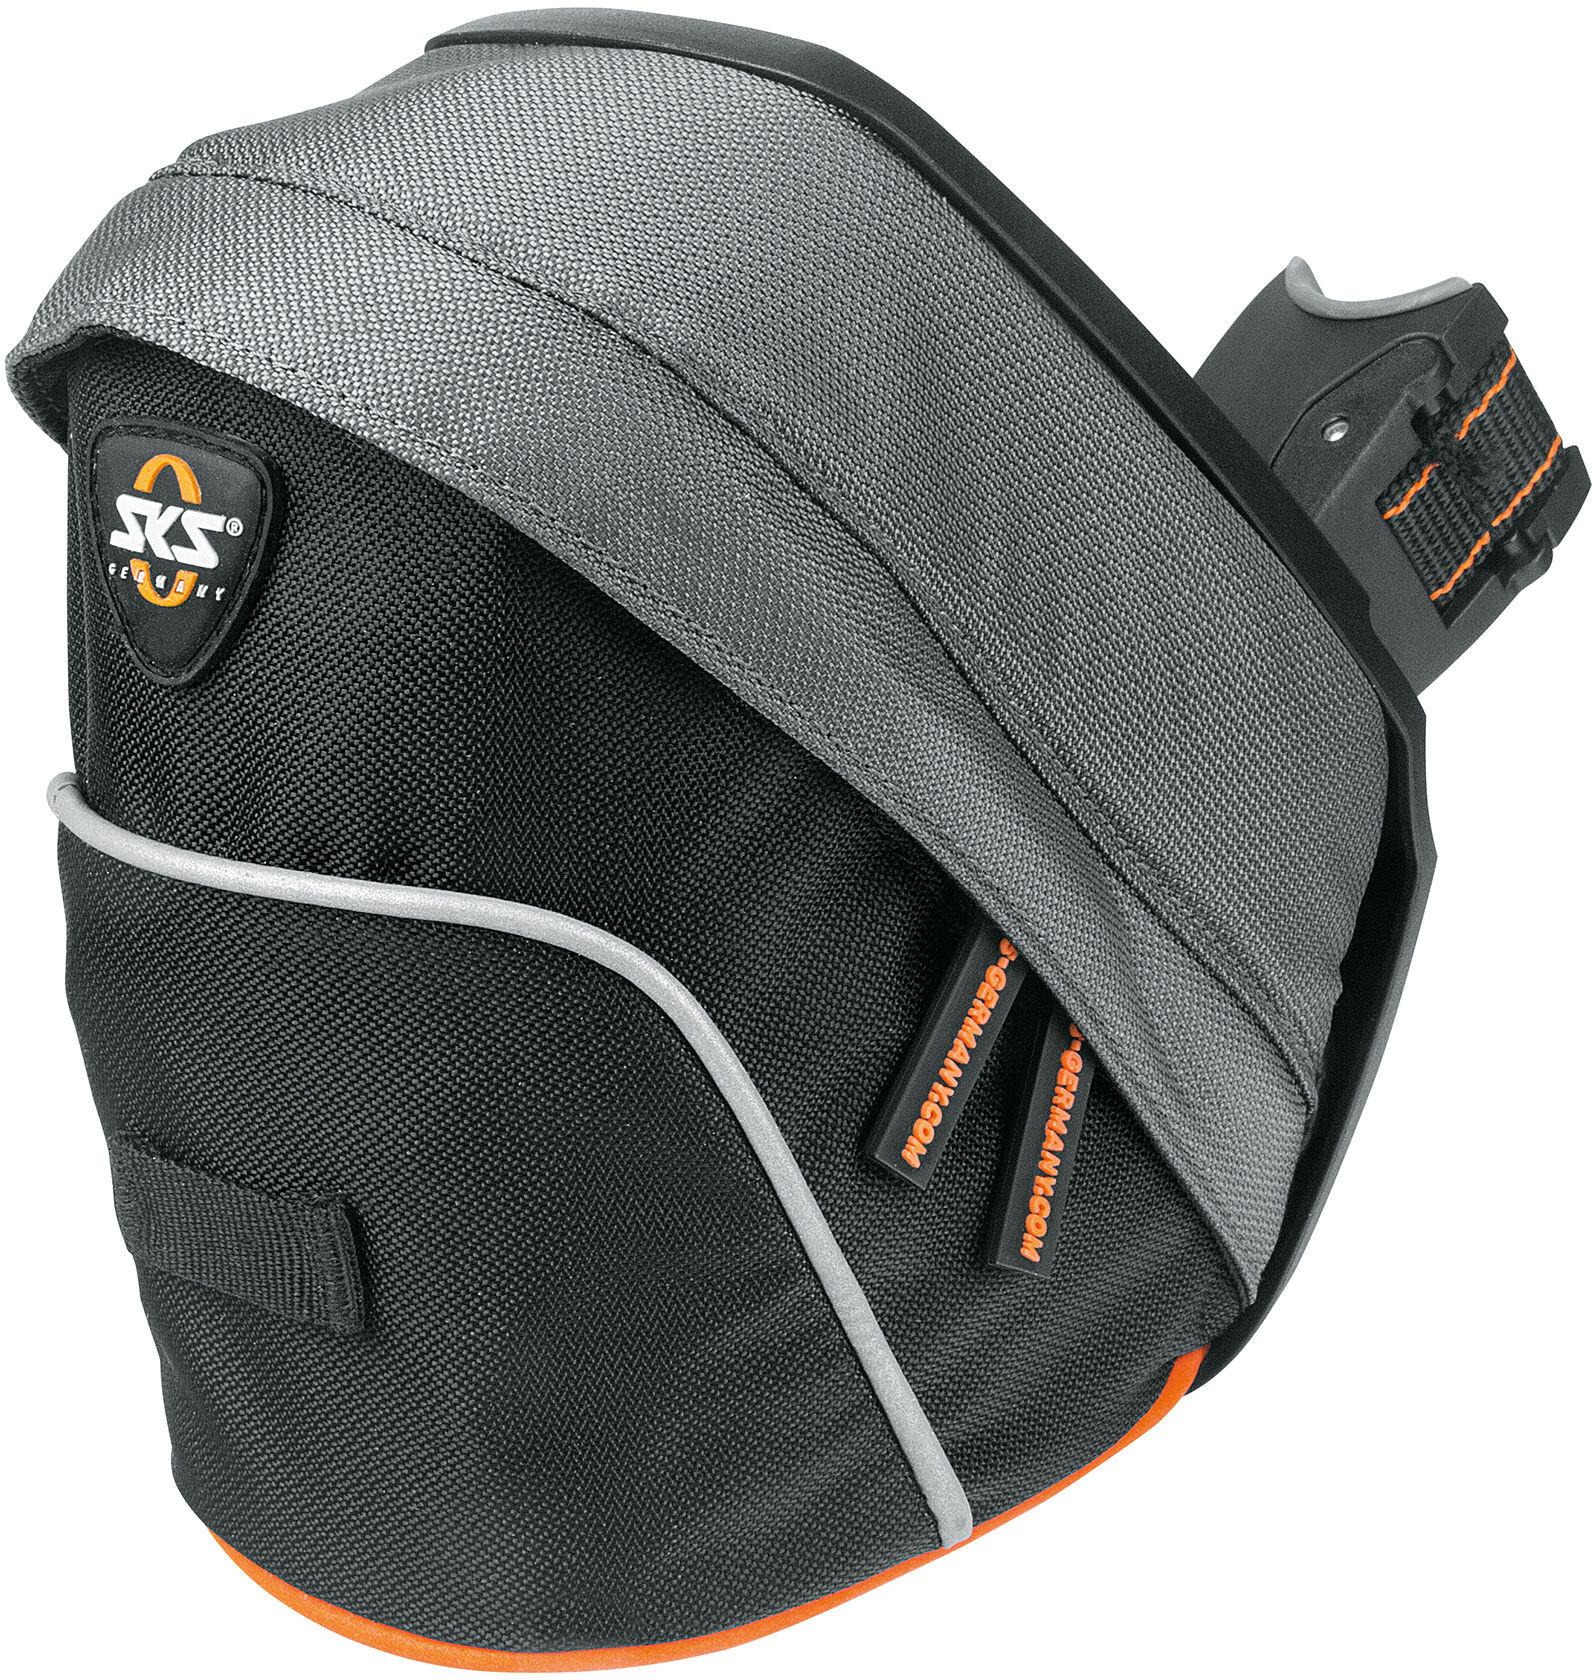 sks tour bag sac de selle noir gris orange boutique. Black Bedroom Furniture Sets. Home Design Ideas